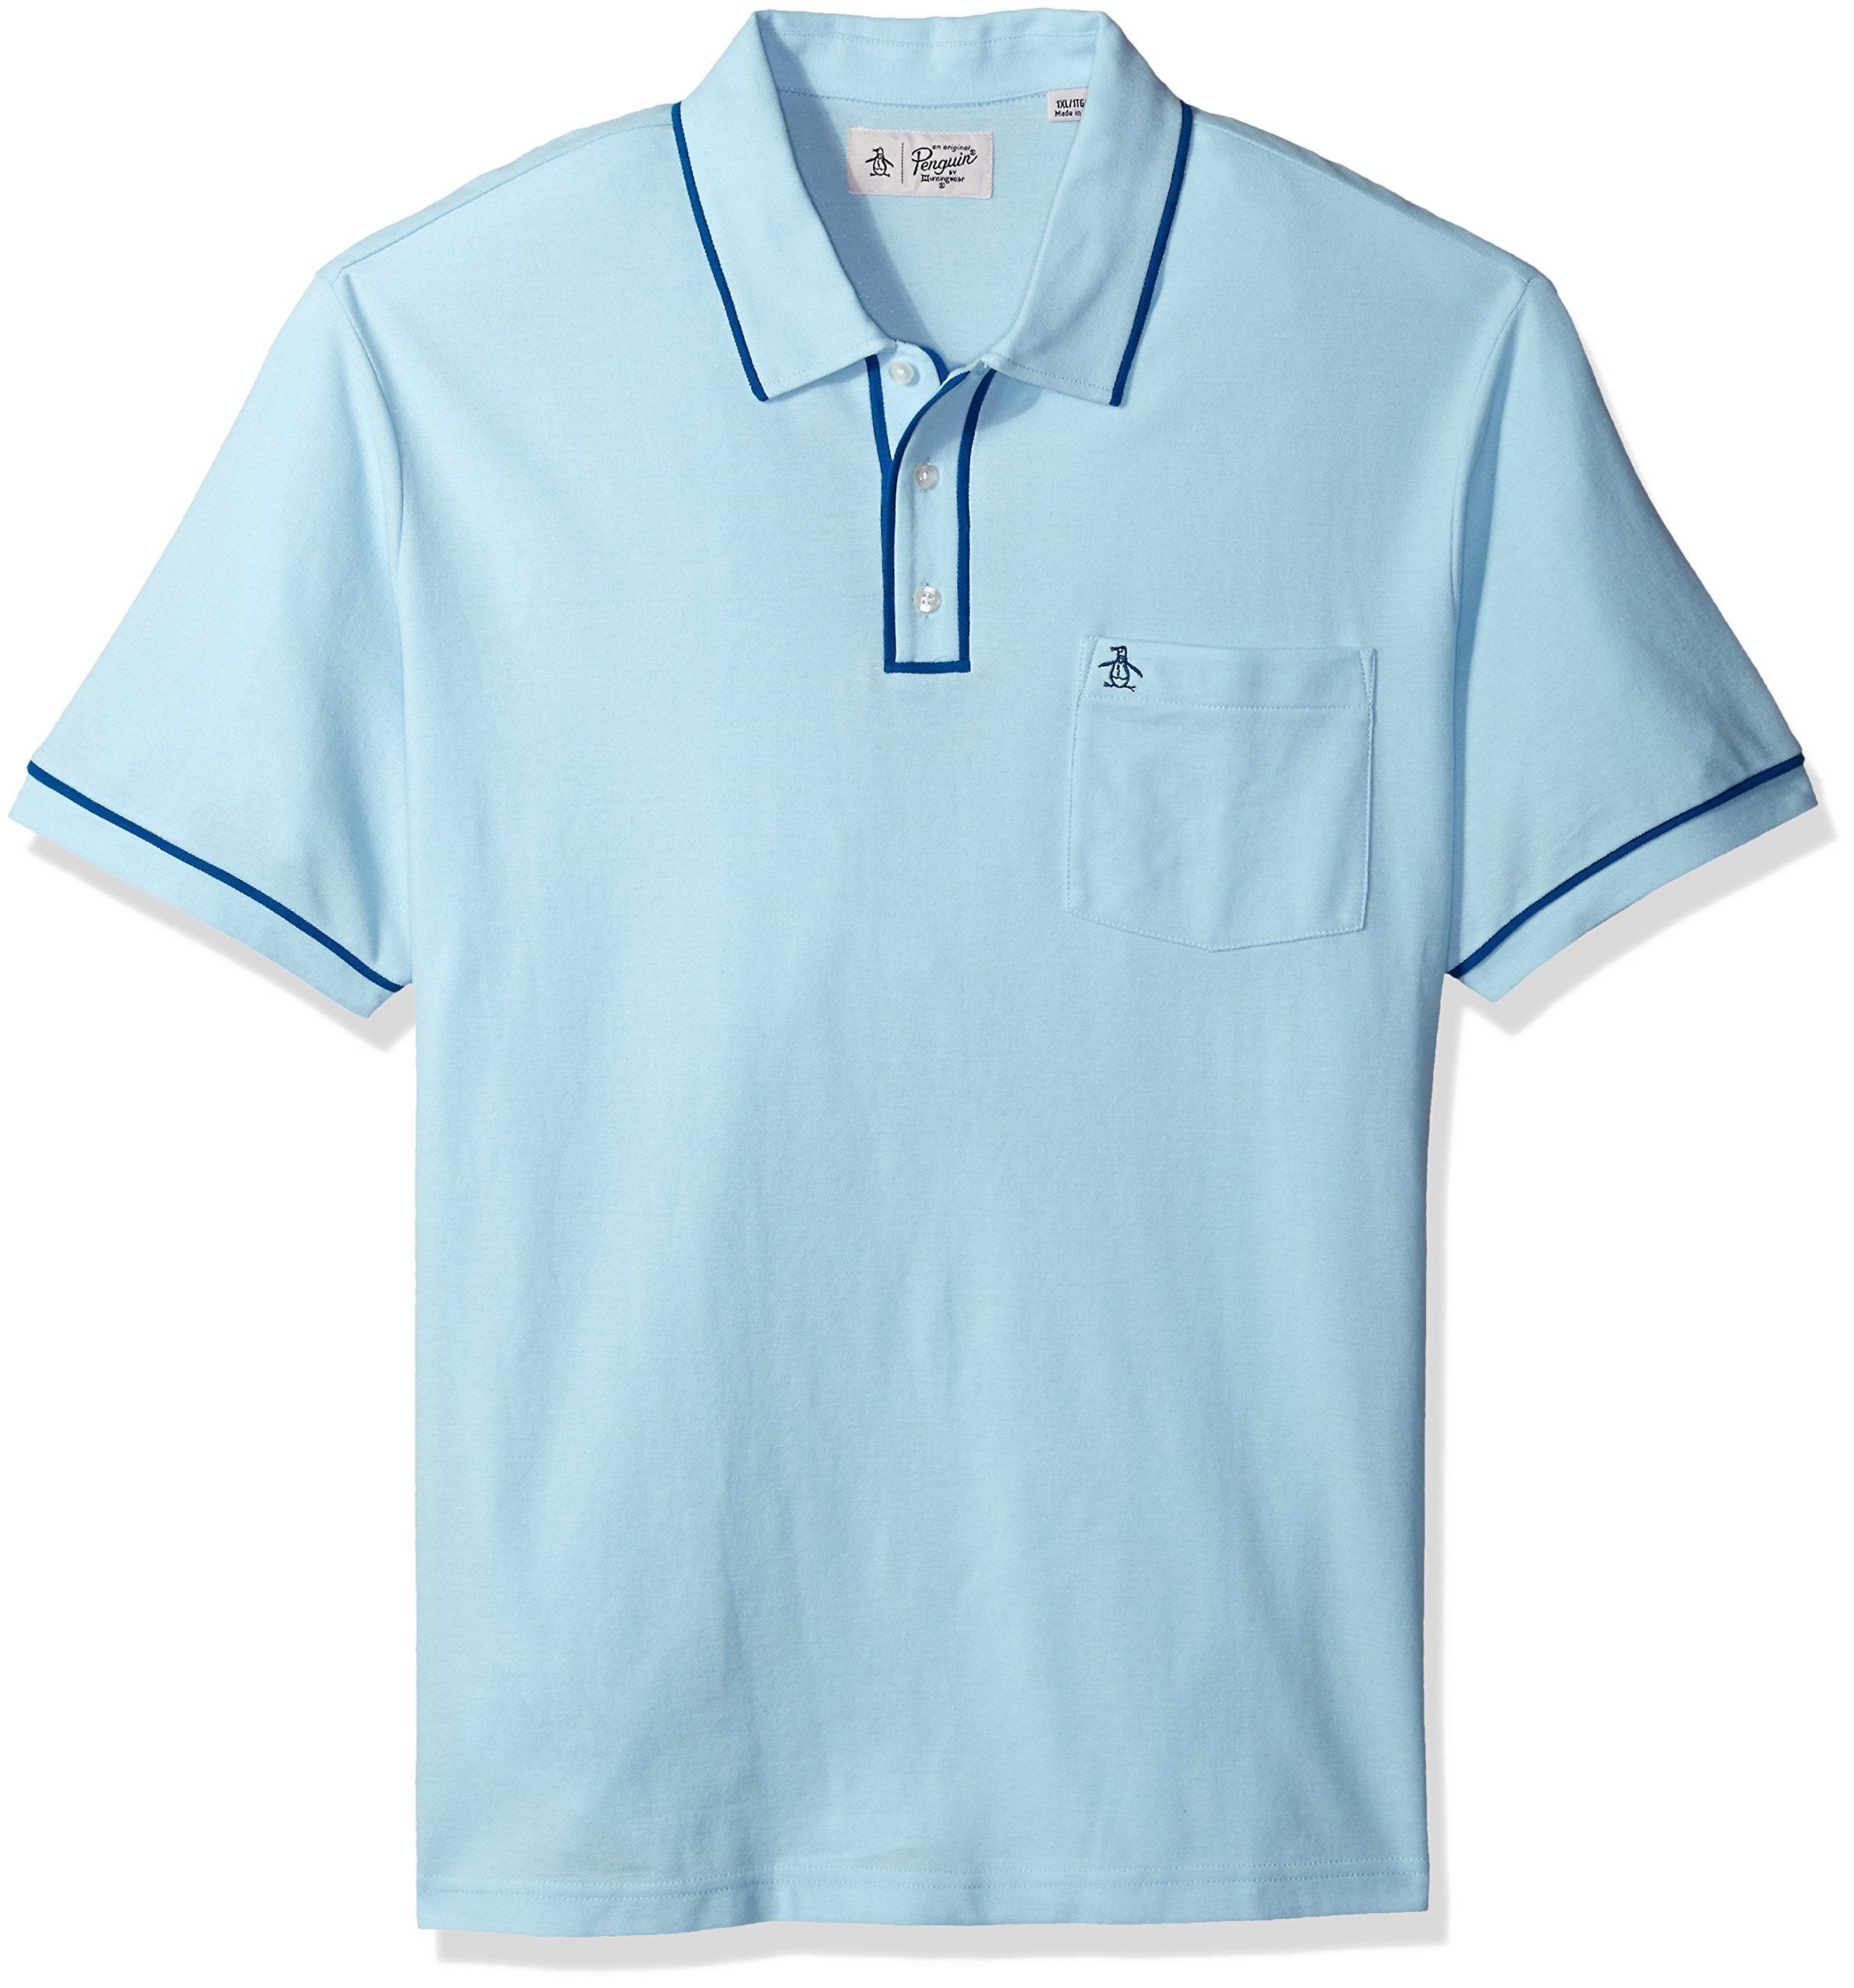 Original Penguin Men's Big Earl Pique Polo Shirt, Crystal Blue, 3 XL-Extra Large/Tall